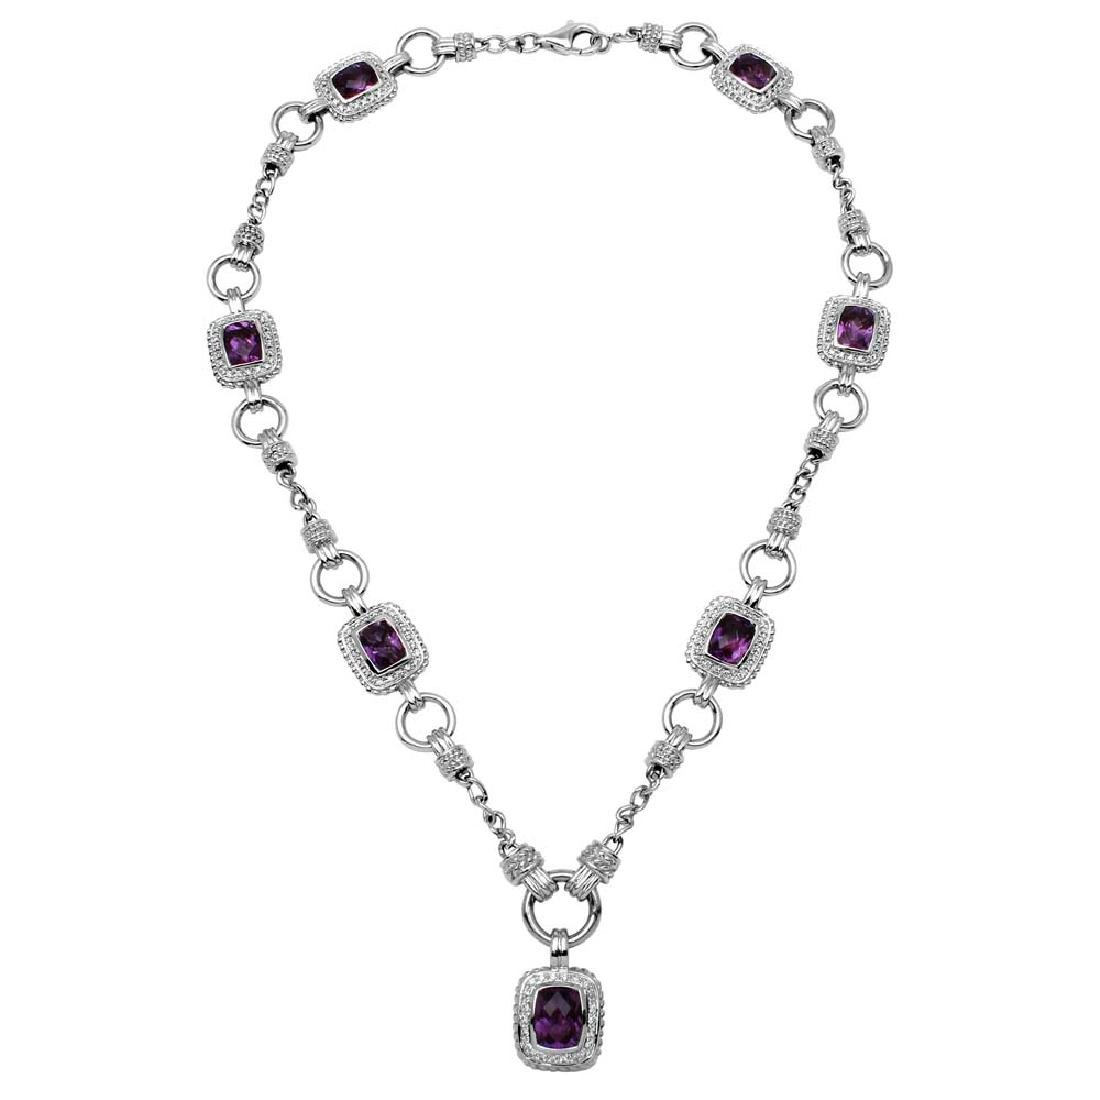 14K Gold 11.83 CTW Amethyst & Diamond Necklace